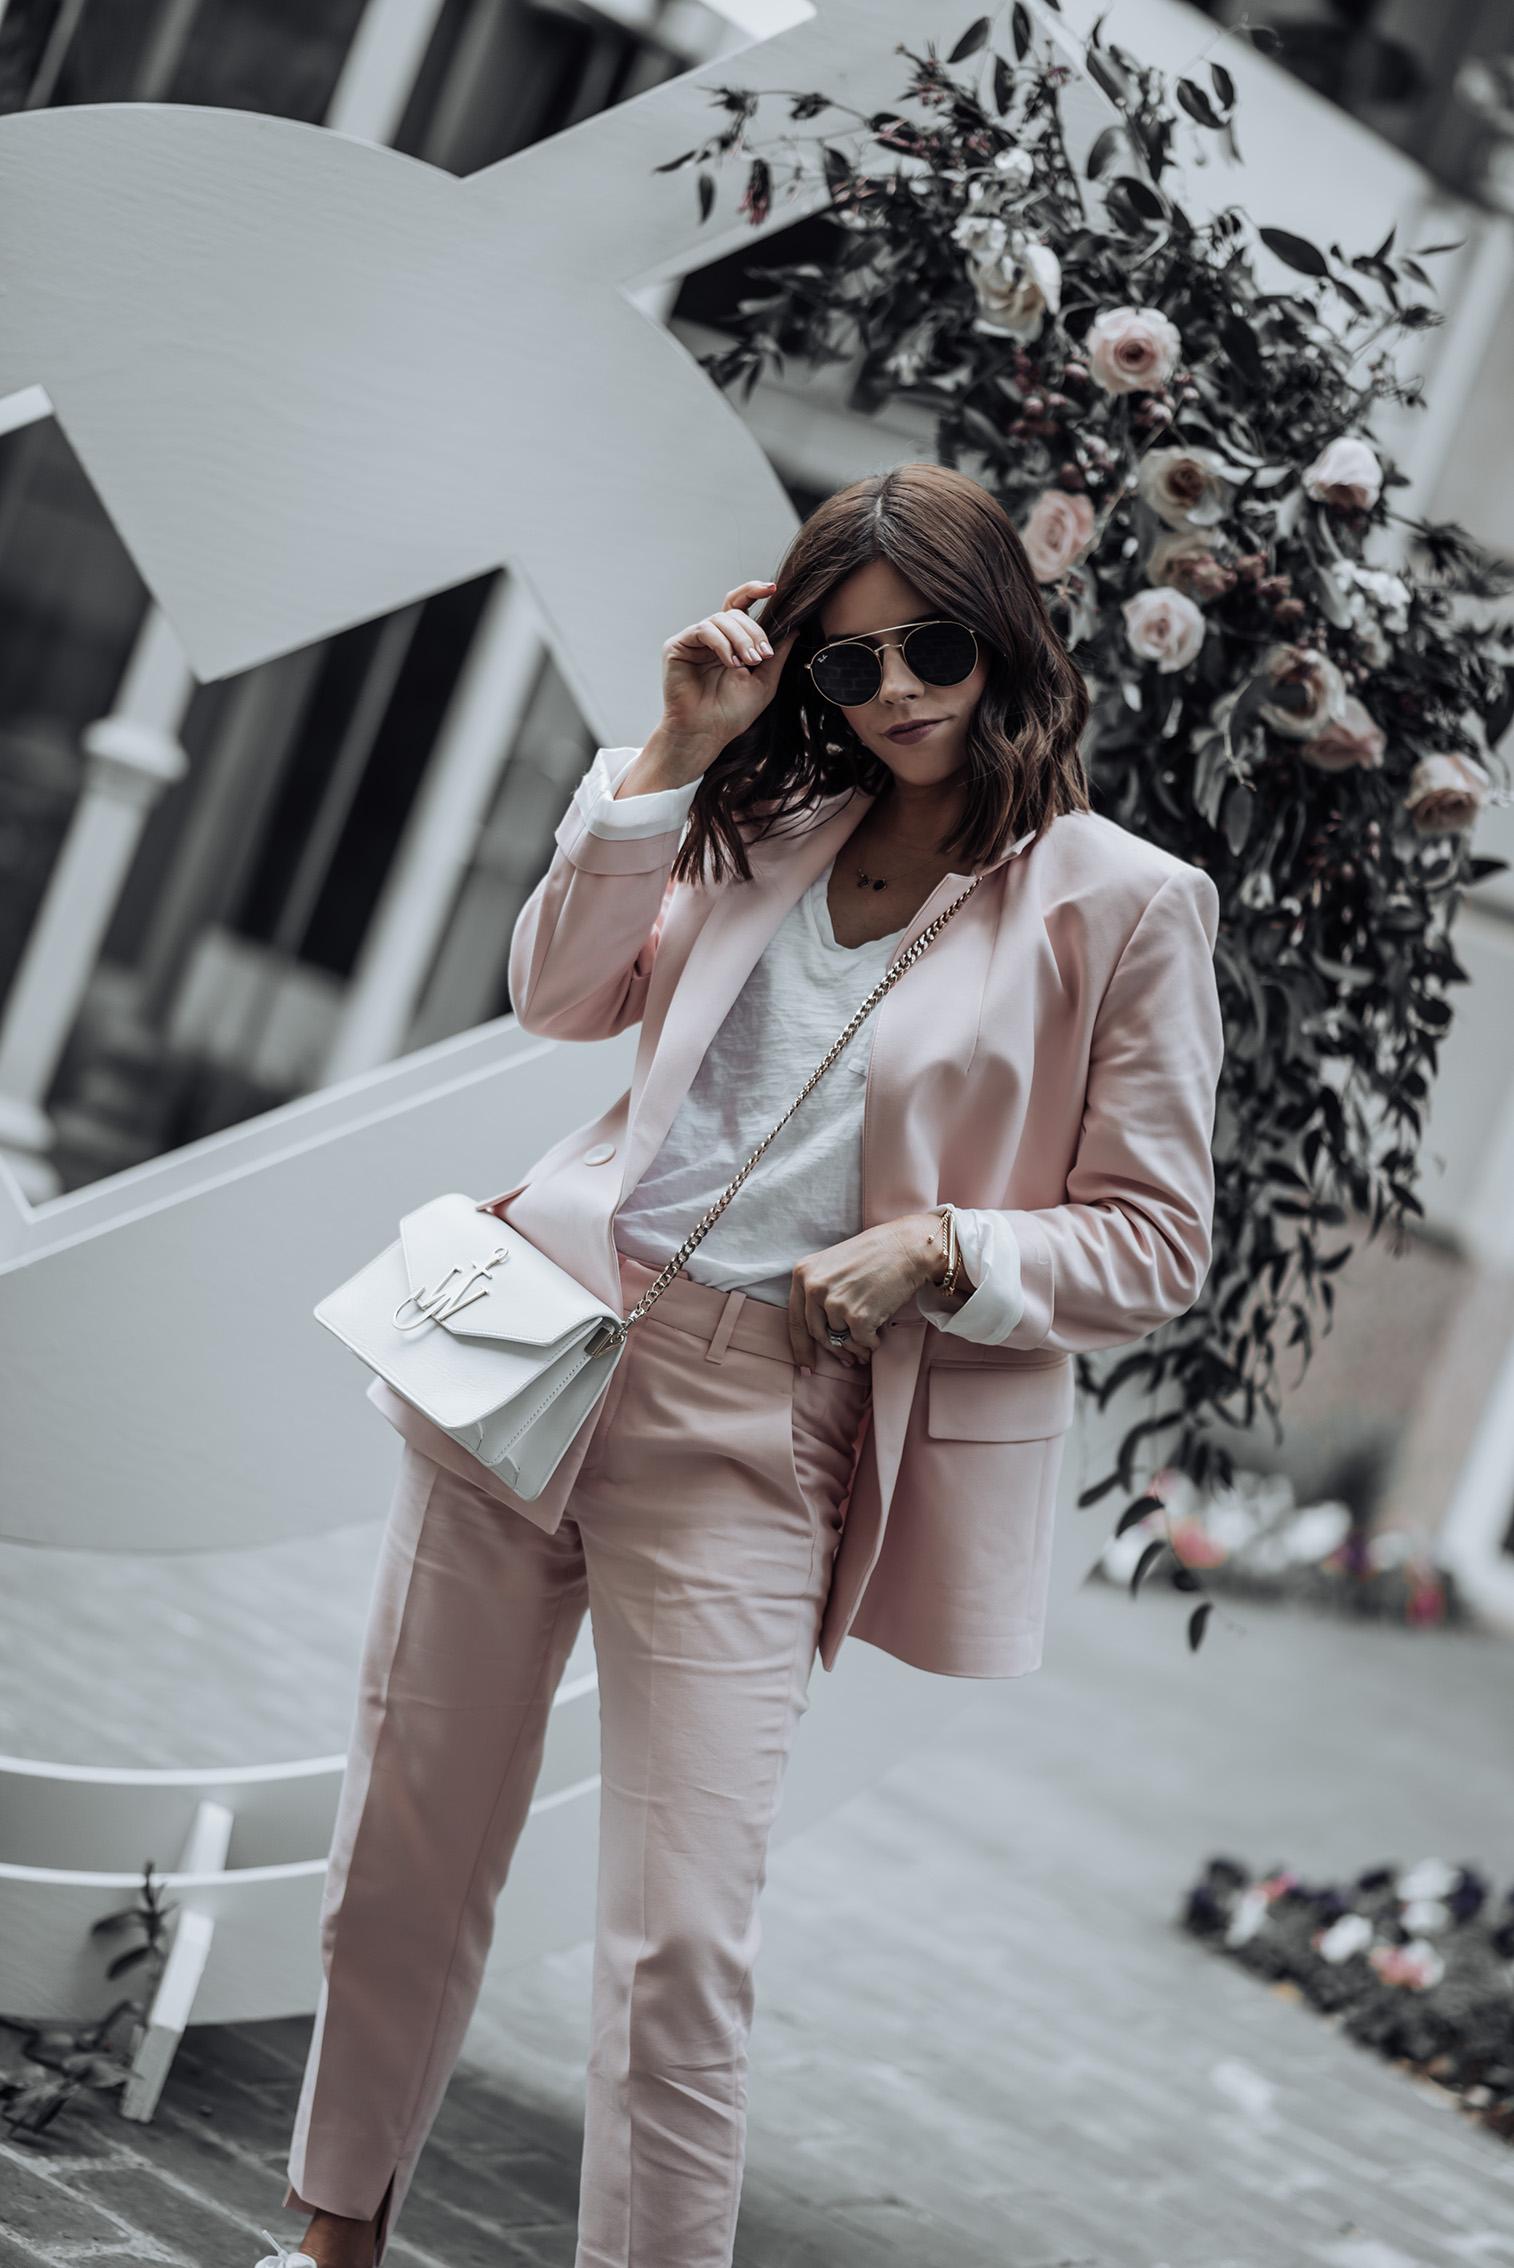 Pant suit  Blush pant suit Zara (similar Blazer & Pant)   J.W. Anderson Bag   Ray-bans   Superga Platforms   #liketkit #pantsuit #zara #streetstyle #blogger